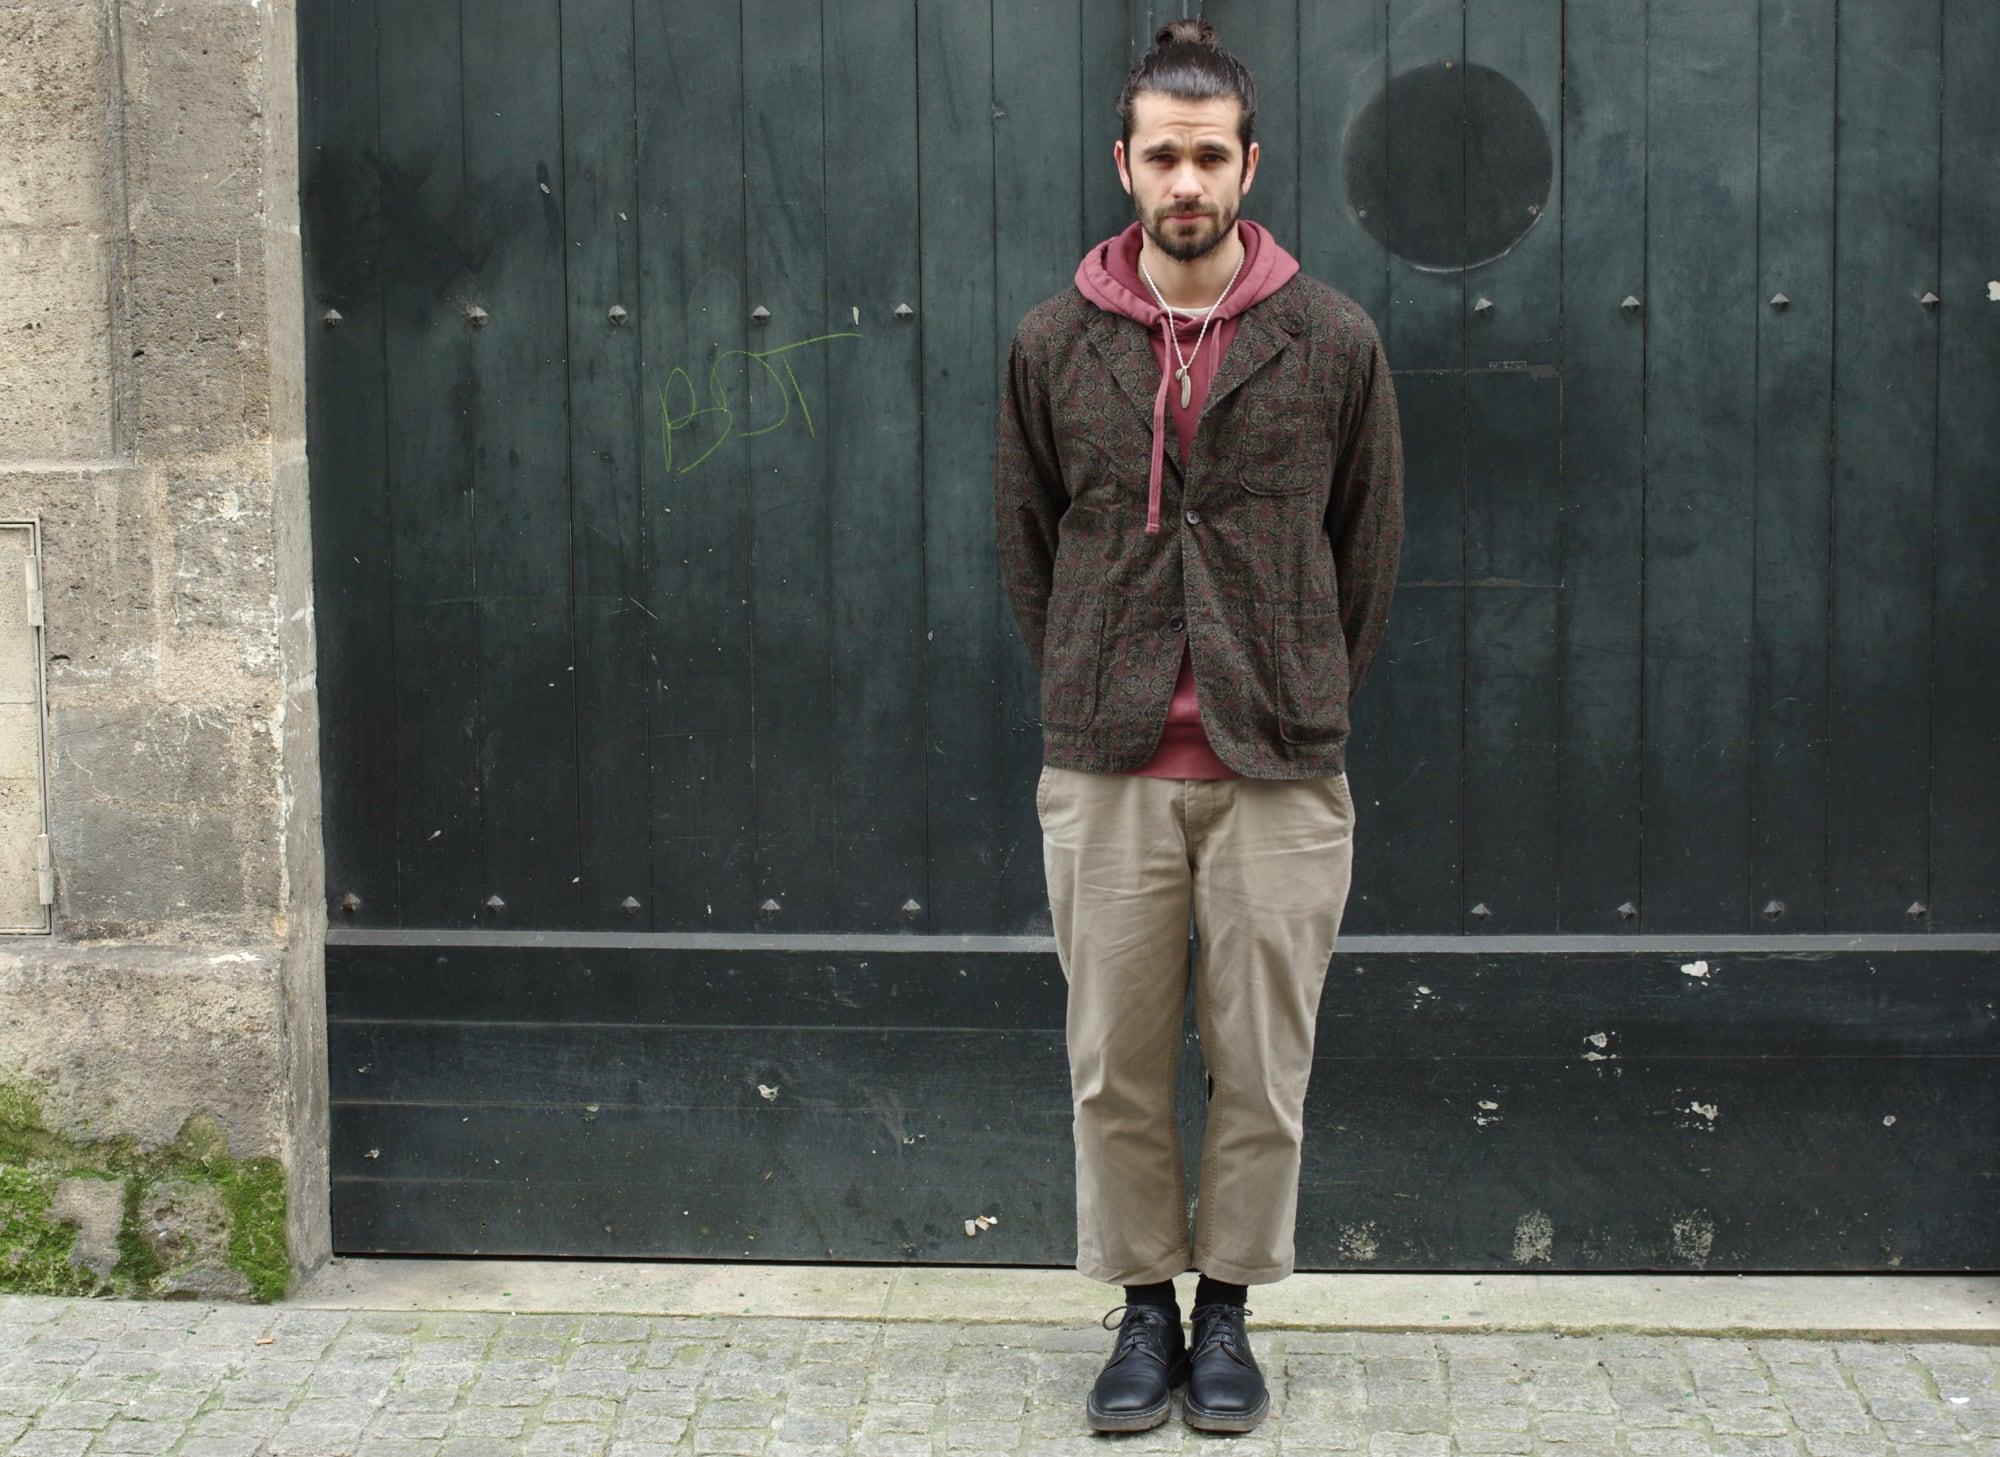 Comment porter un pantalon ample chino coupe droite dans un style masculin norse projects aros heavy chino coupé court